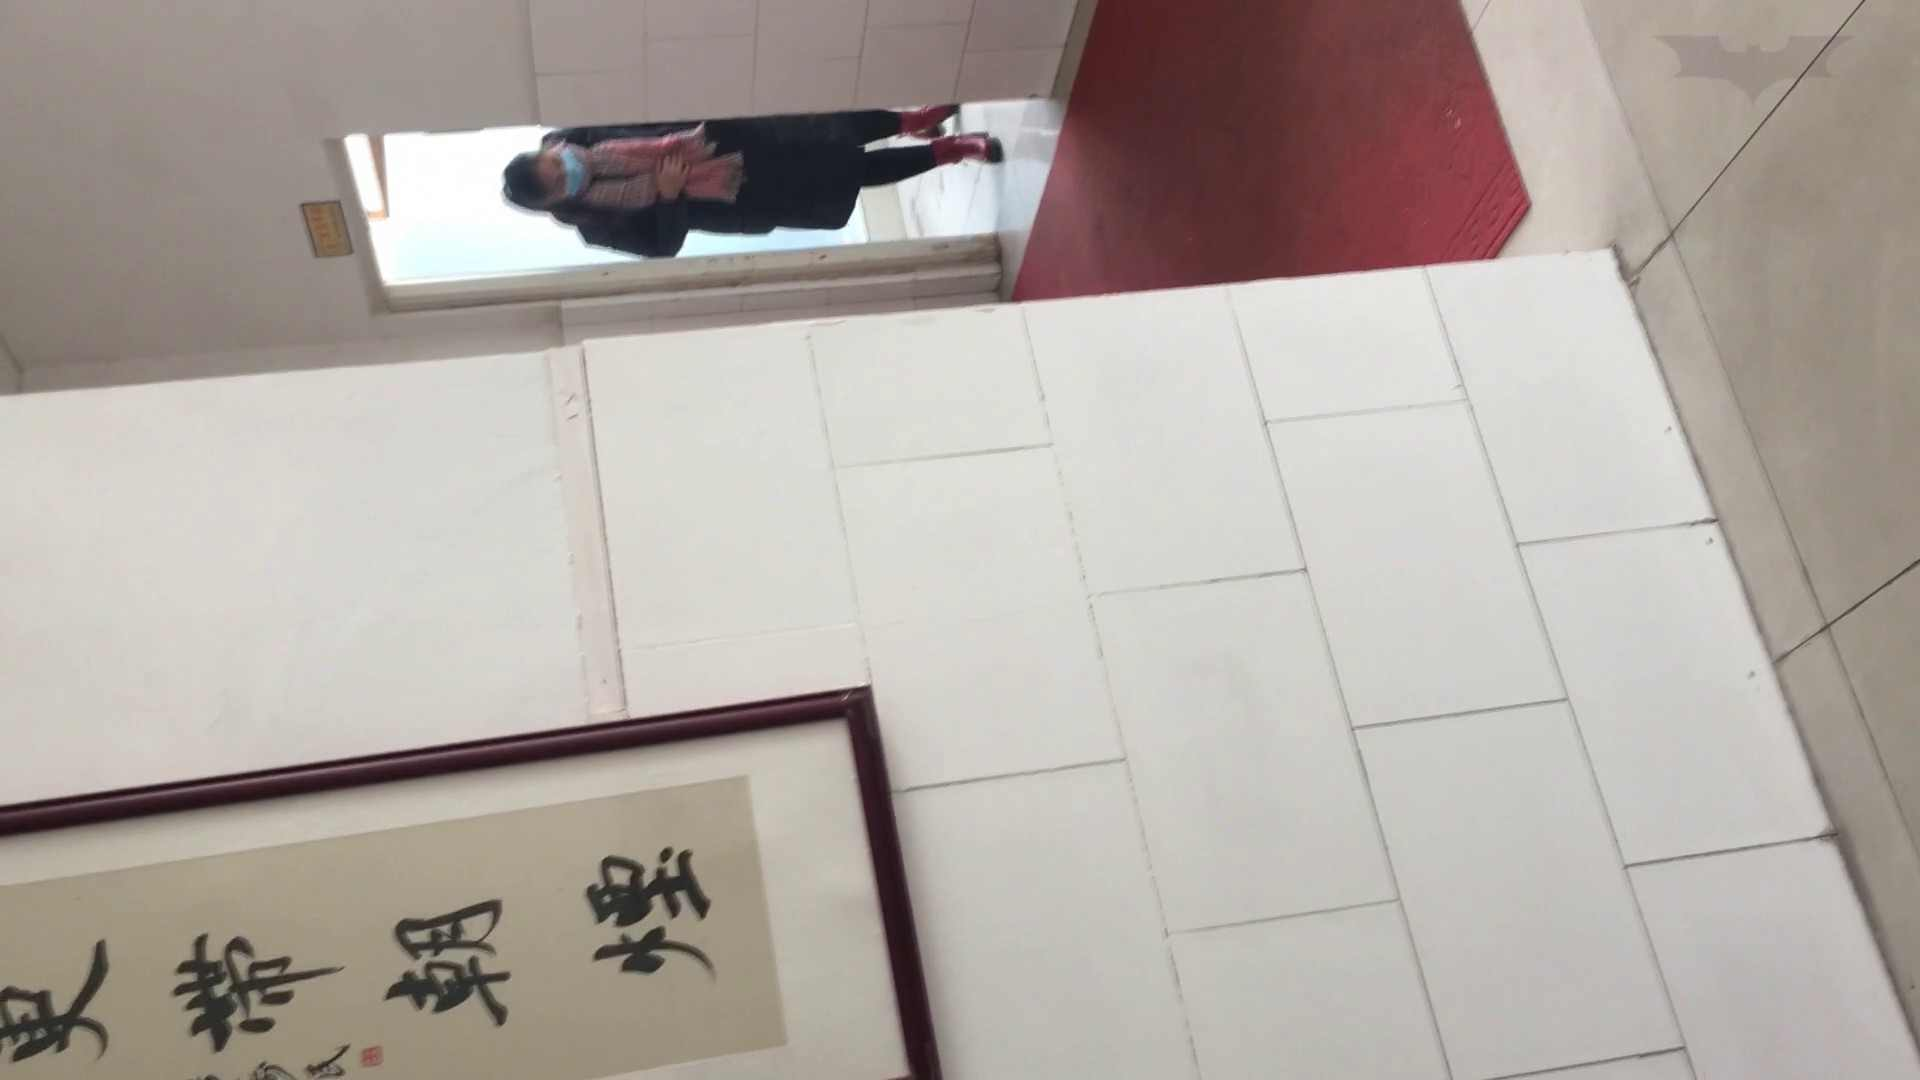 芸術大学ガチ潜入盗撮 JD盗撮 美女の洗面所の秘密 Vol.82 潜入 セックス無修正動画無料 83PIX 29